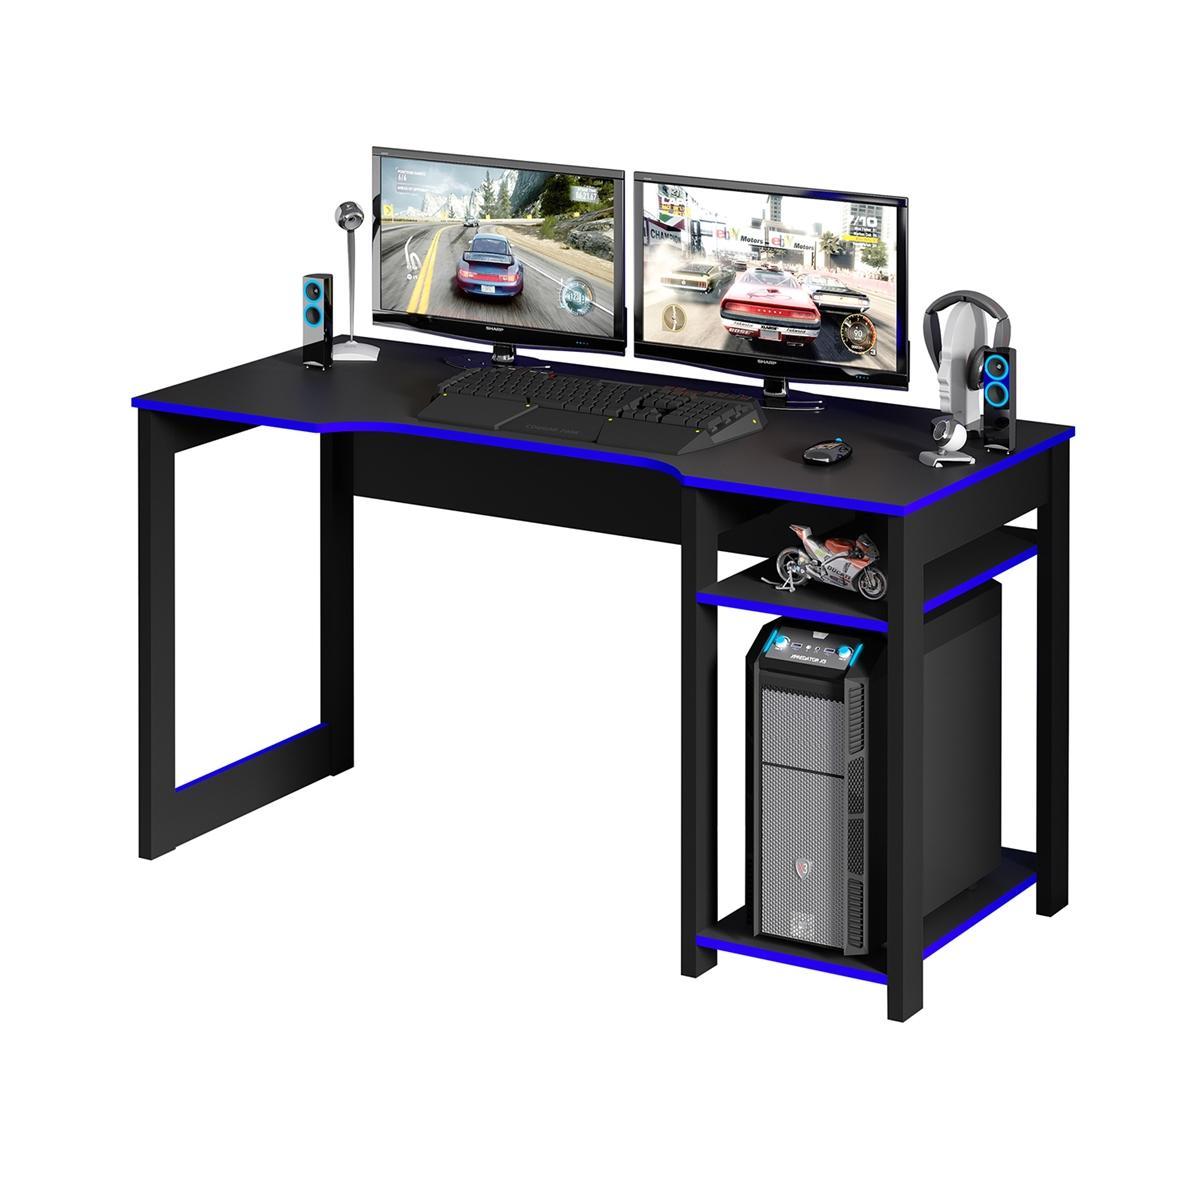 Mesa Para Computador Gamer Streamer 2 Prateleiras Preto/Azul - FdECOR